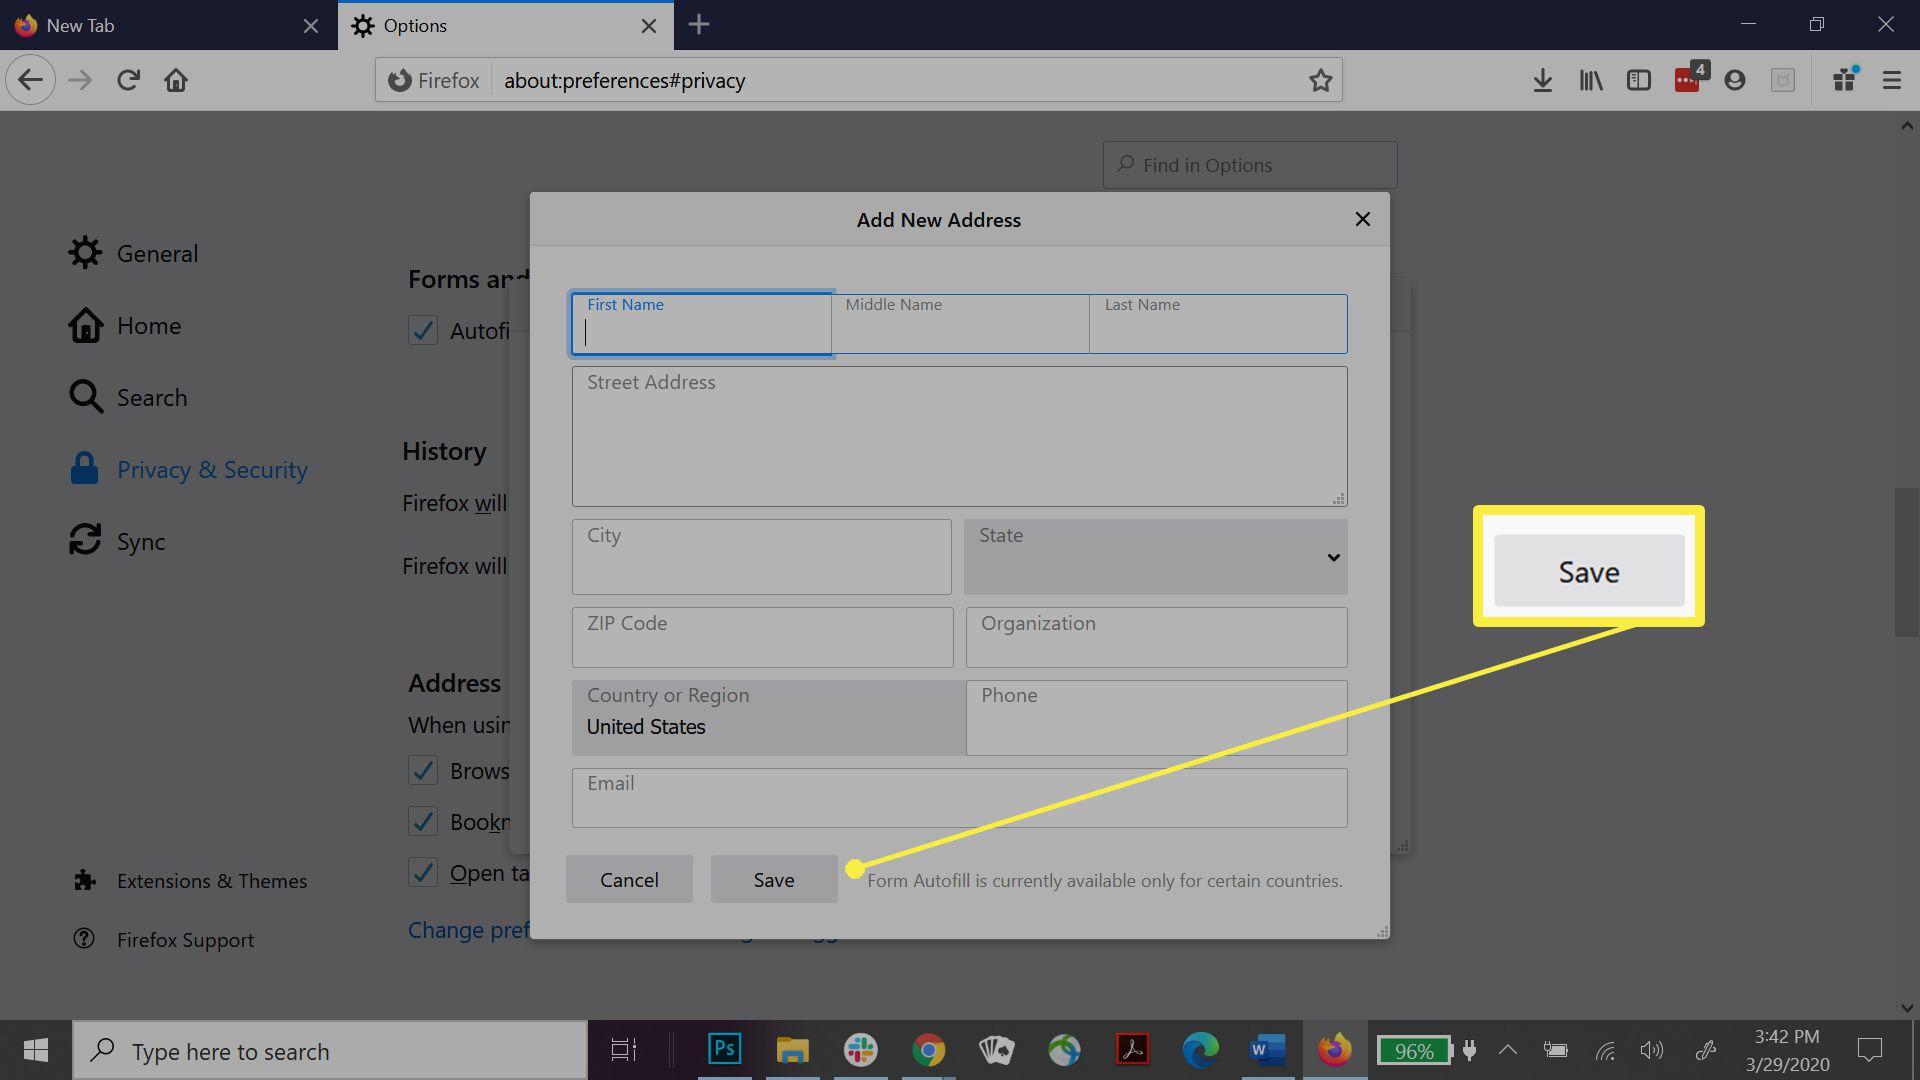 Adding a new address in Firefox.